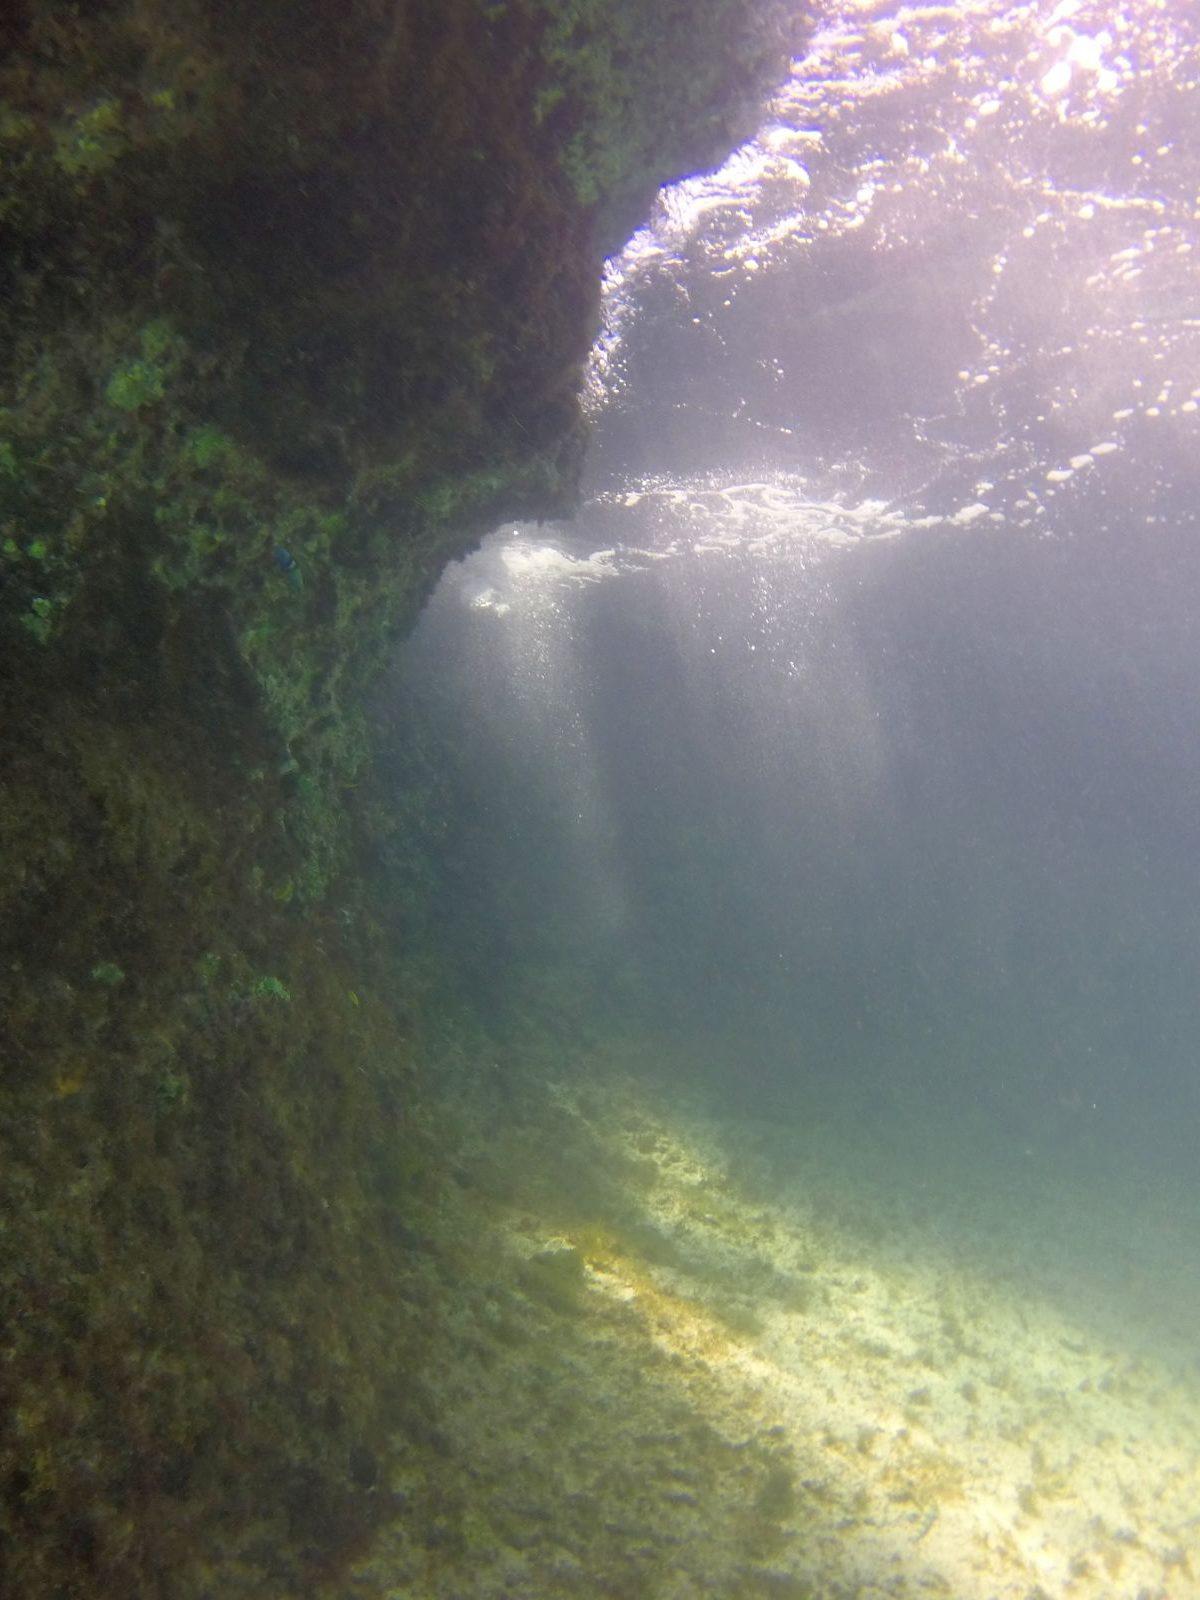 Under the shoreline